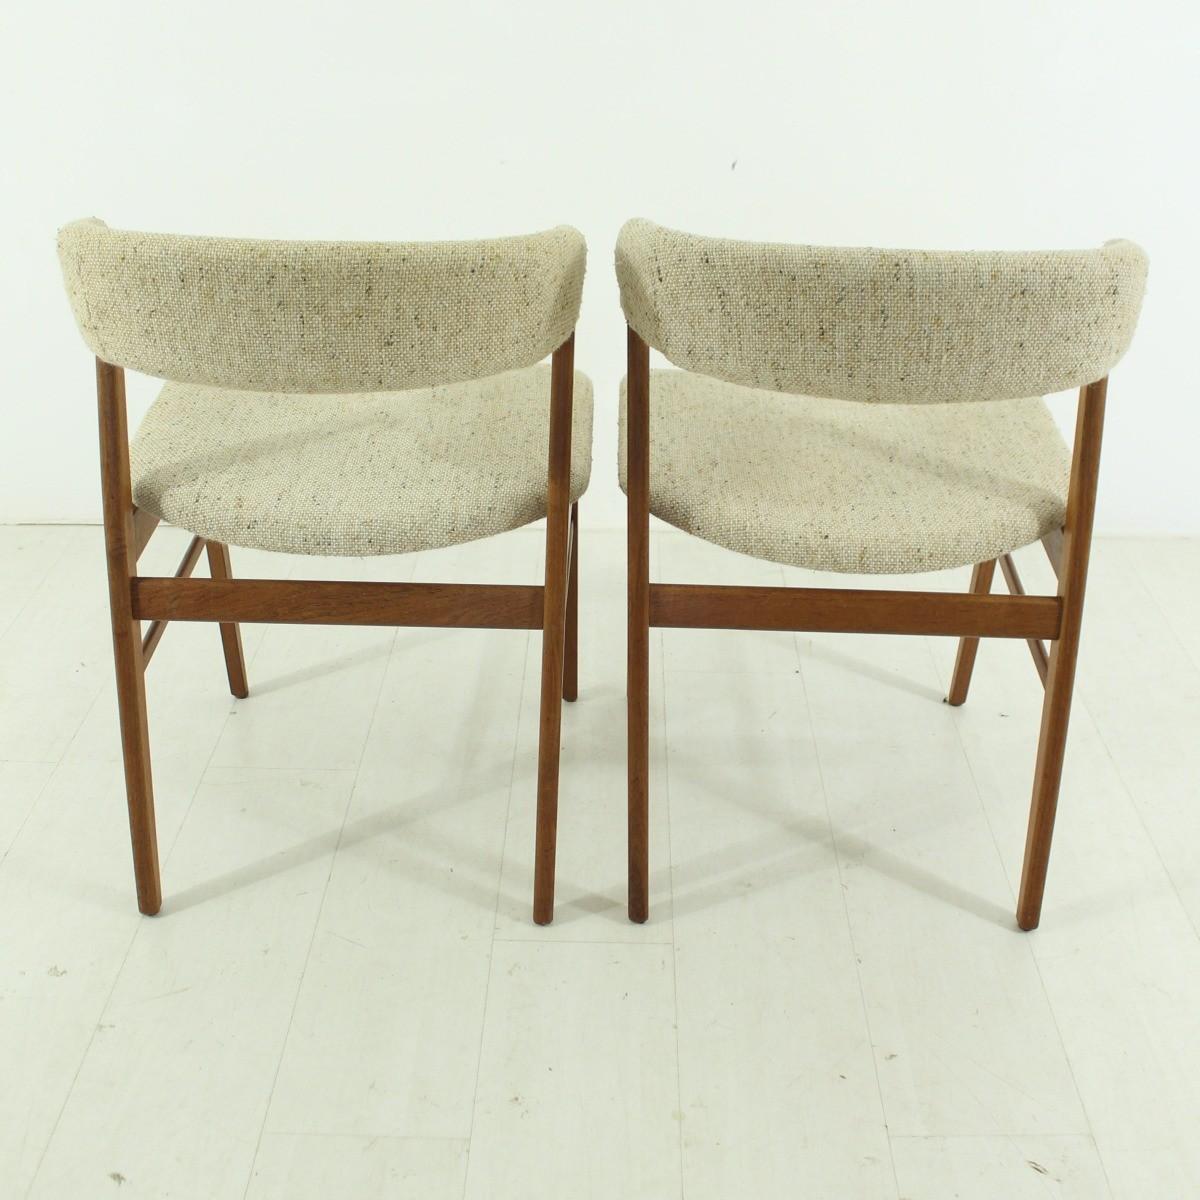 Set of 2 Danish teak chairs 1960s Design Market